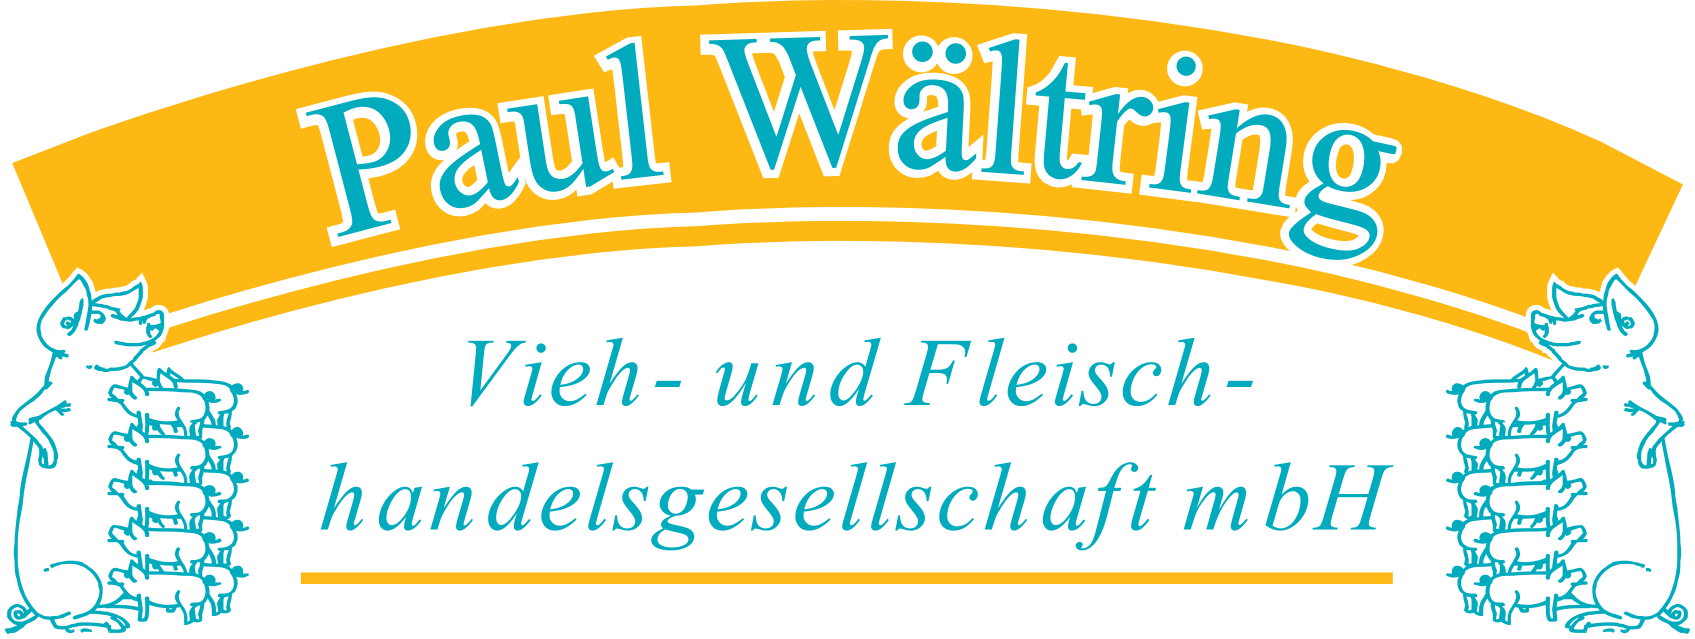 Paul Wältring Logo